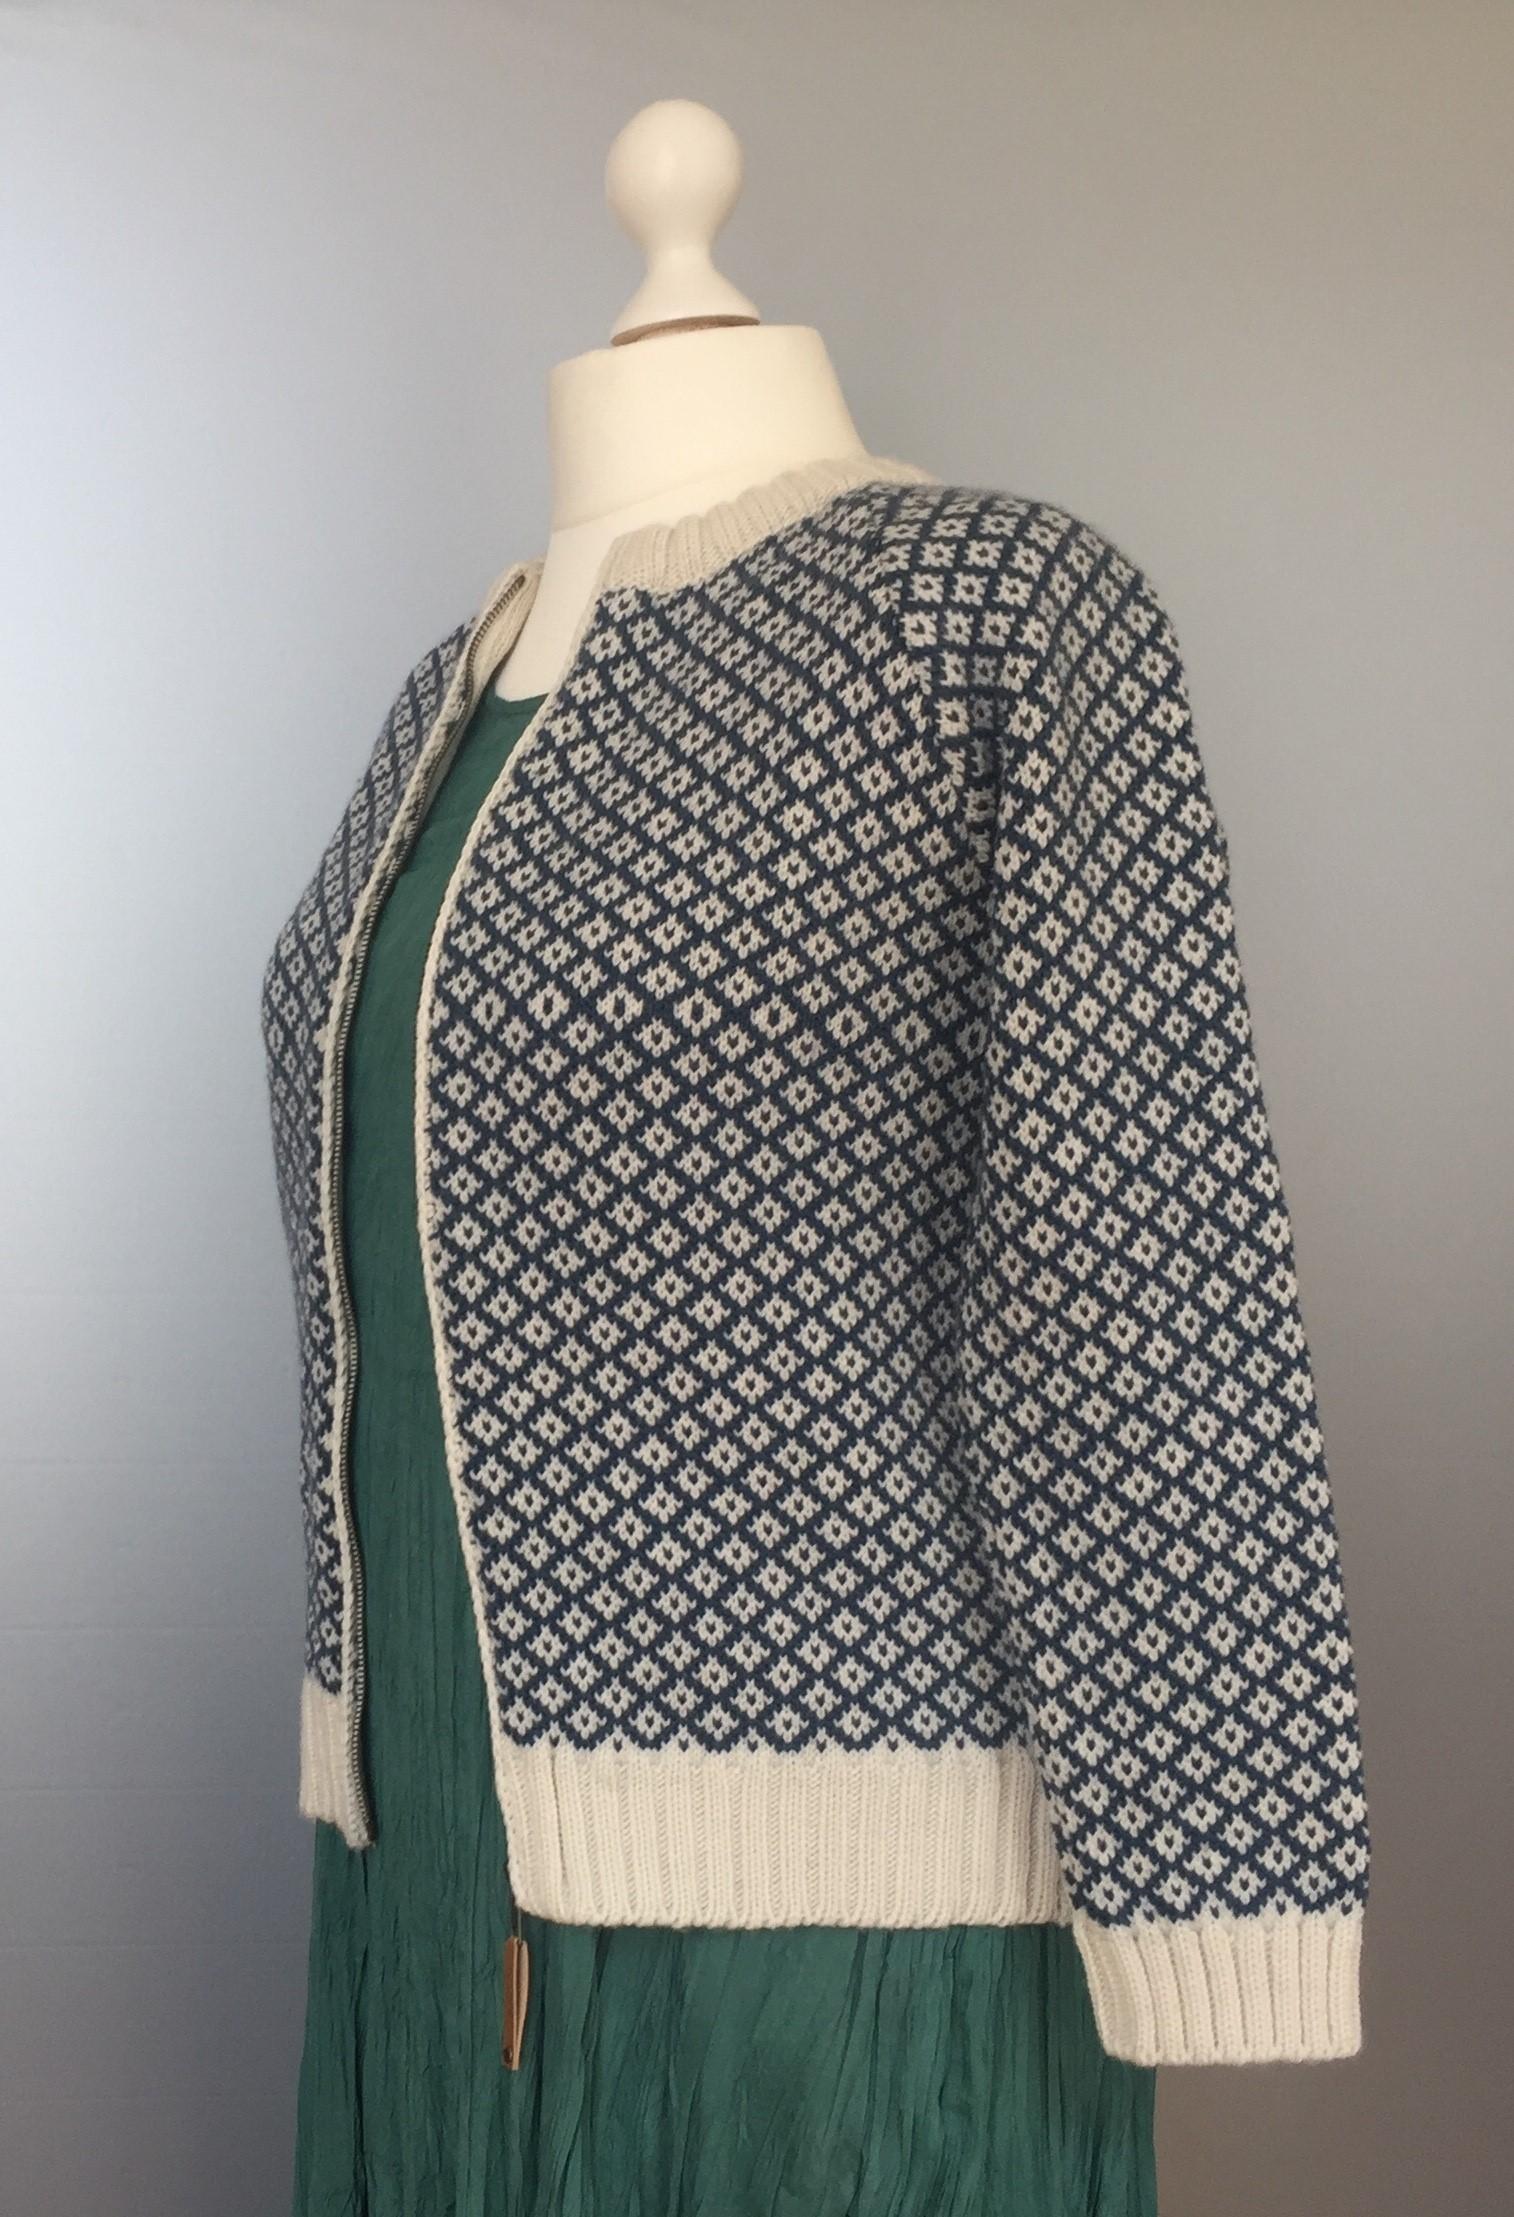 Fuza - merinould - Iris cardigan natur/petrol, petrol, hipster, dansk design, merino, uld, uldstrik, striktrøje, damestrik, cardigan, uldjakke, strikjakke, sporty, afslappet, flot, cool, moderne, biti, ribe